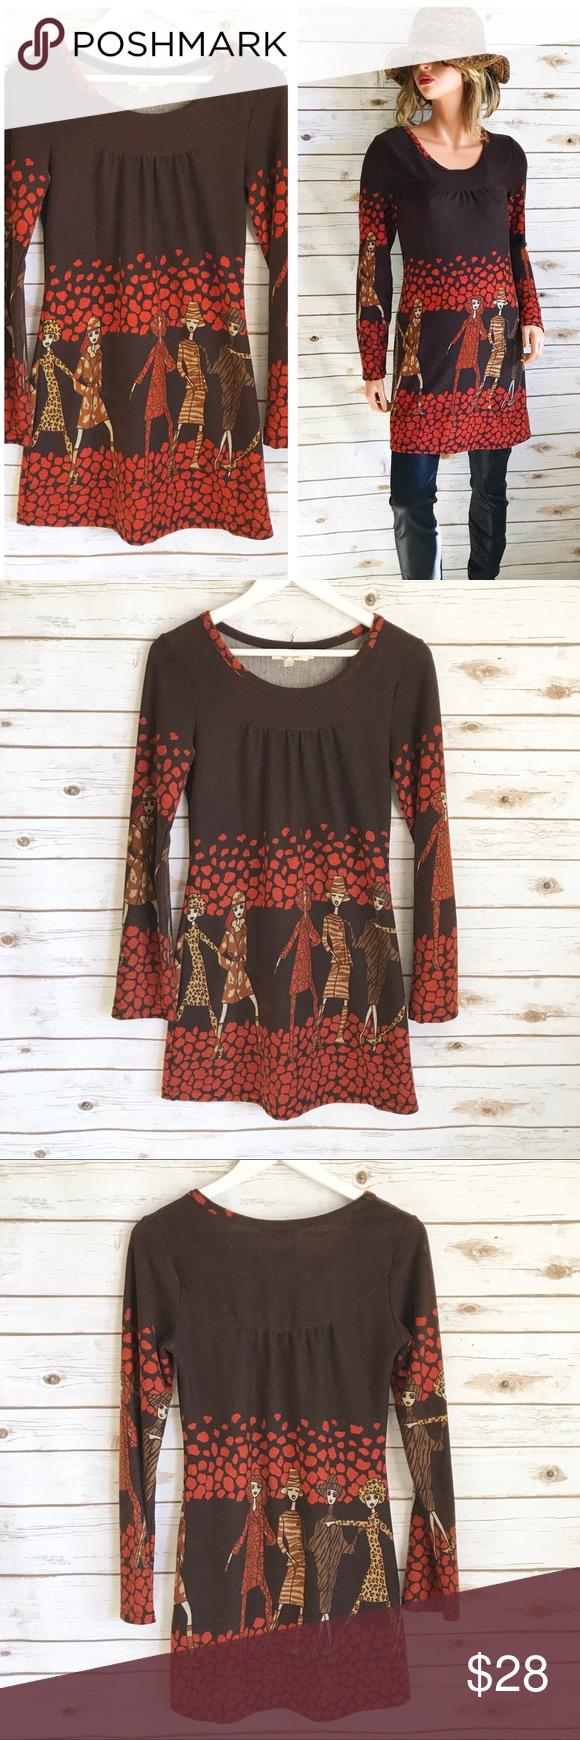 795a494e917d3 ARYEH Fashionista Sweater Tunic Dress